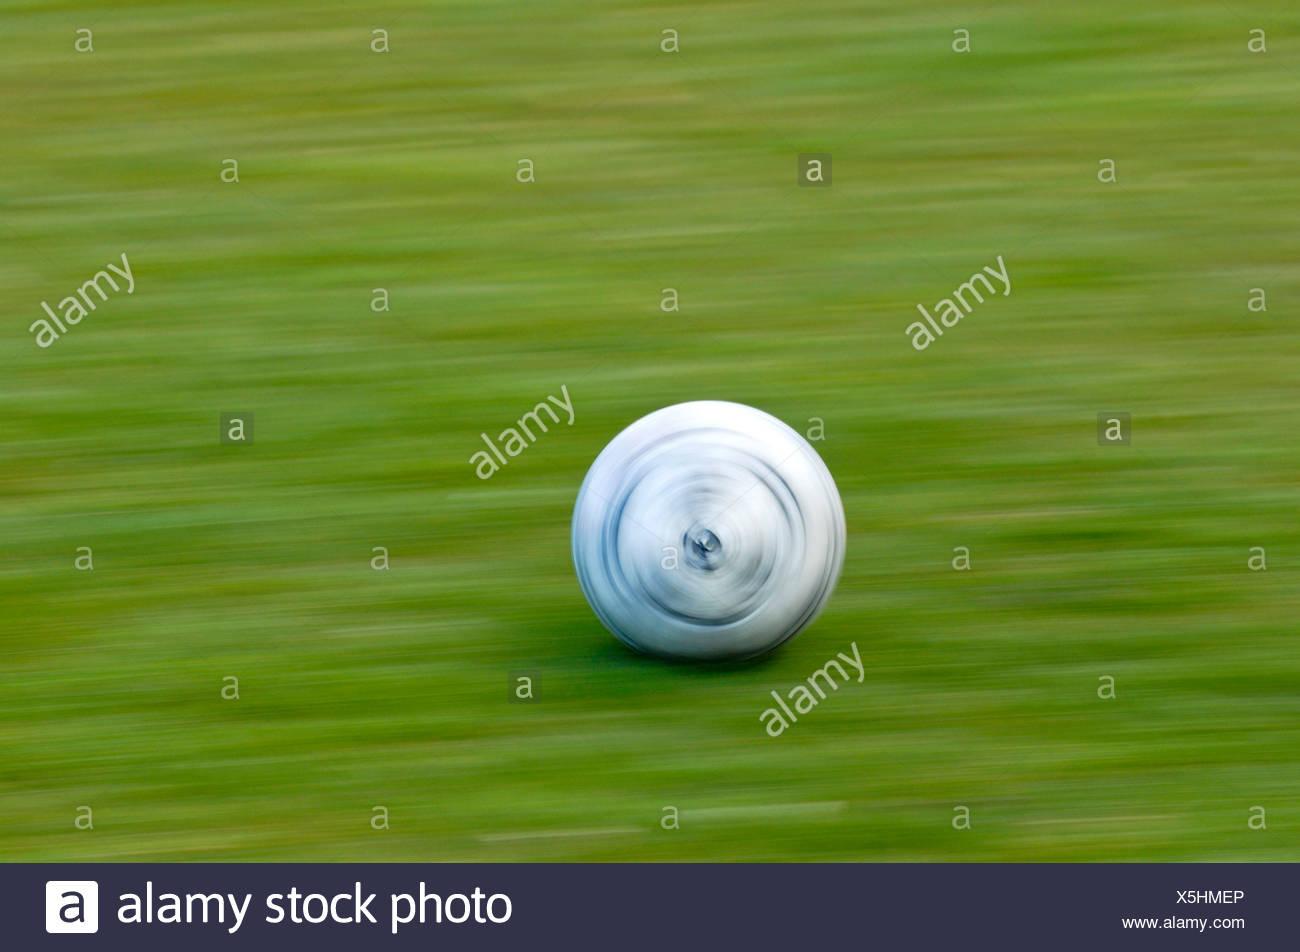 Football - Stock Image